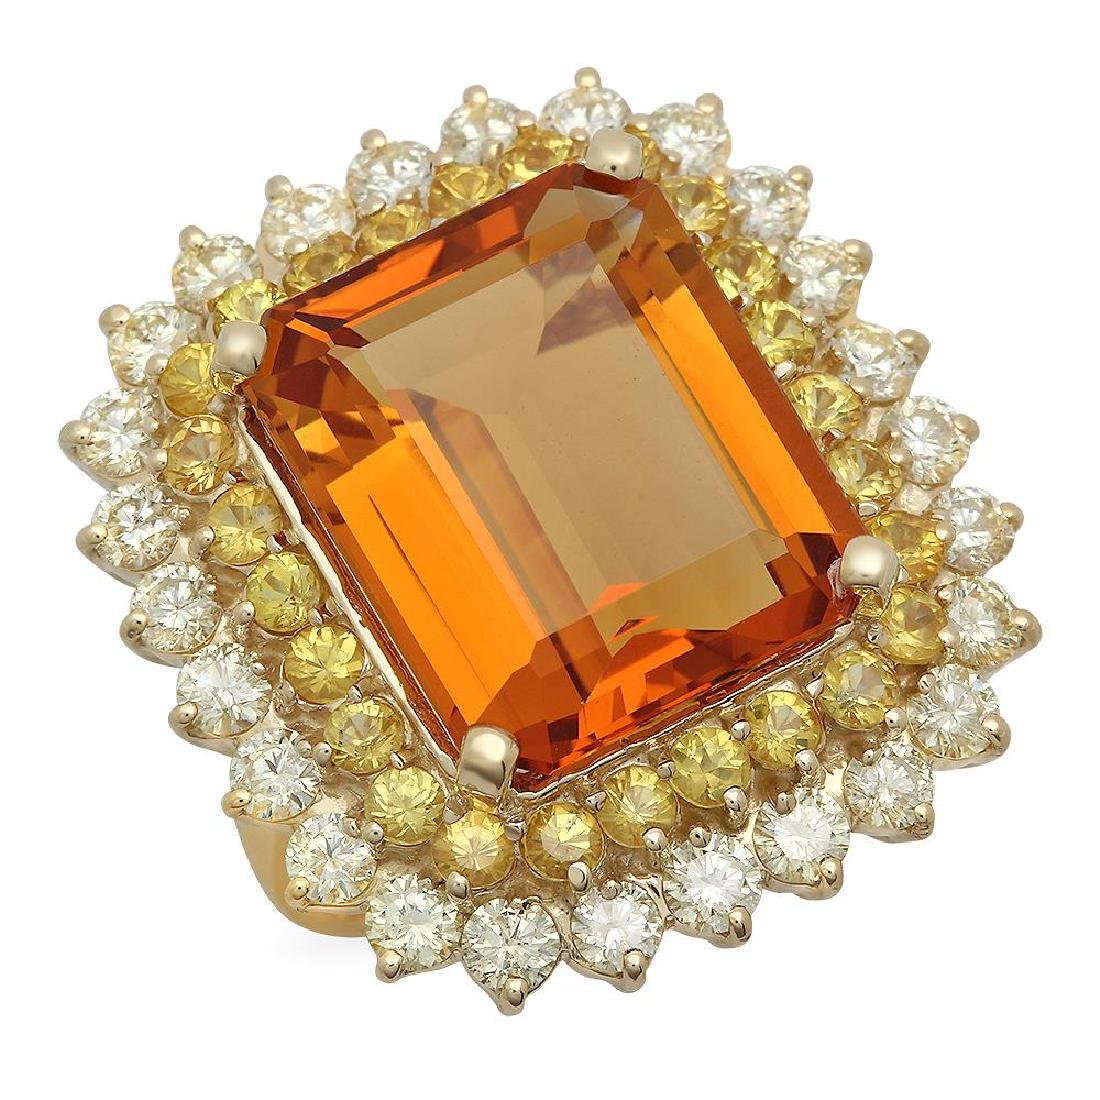 14K Gold 13.81ct Citrine 1.97ct Sapphire 2.39ct Diamond